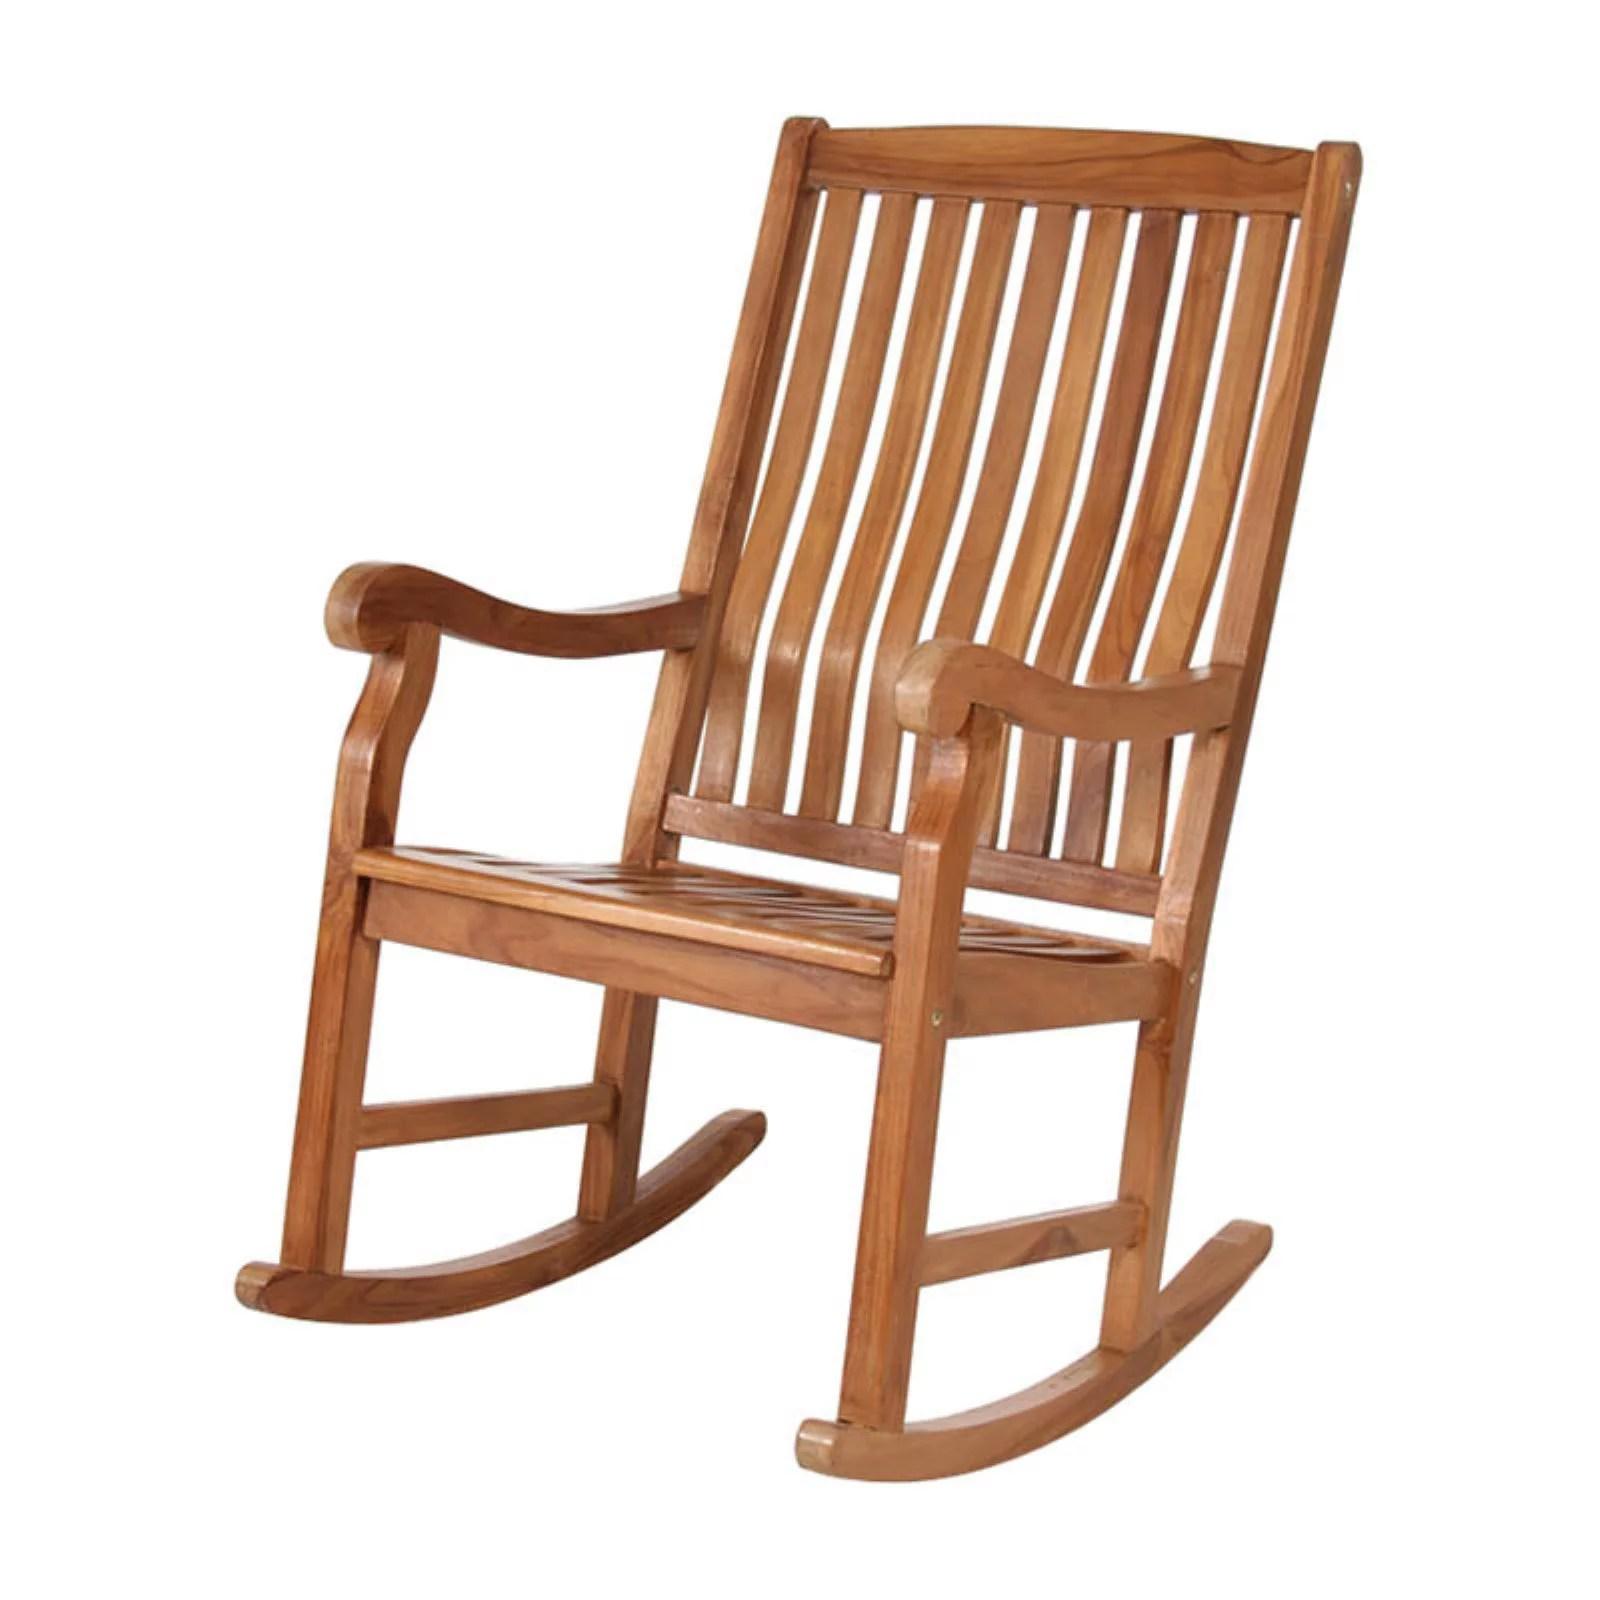 cedar rocking chairs office chair high seat all things teak walmart com